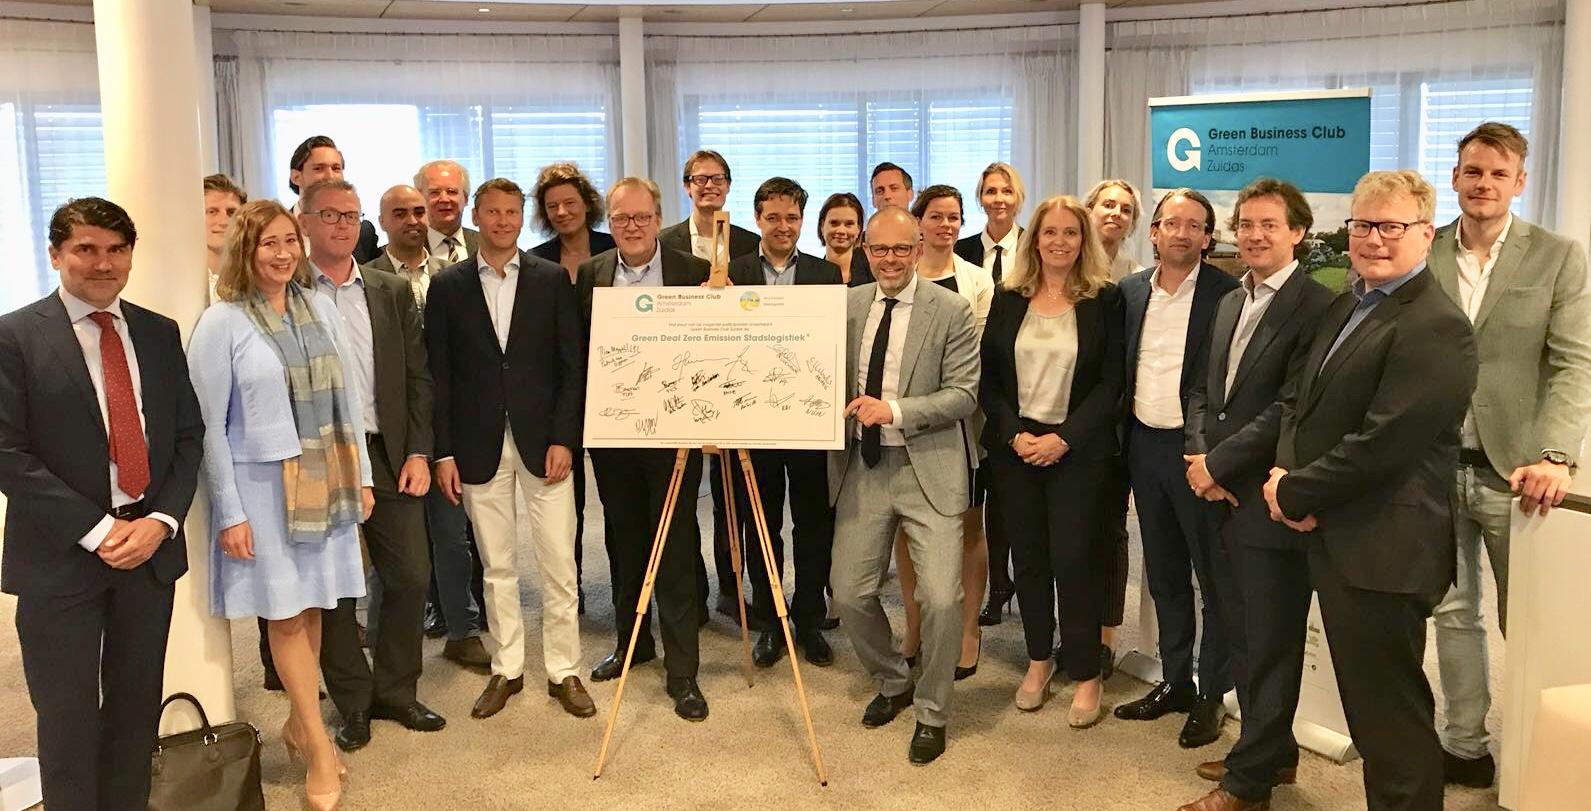 Green business club zuidas ondertekent greendeal zes mra for Amsterdam economica